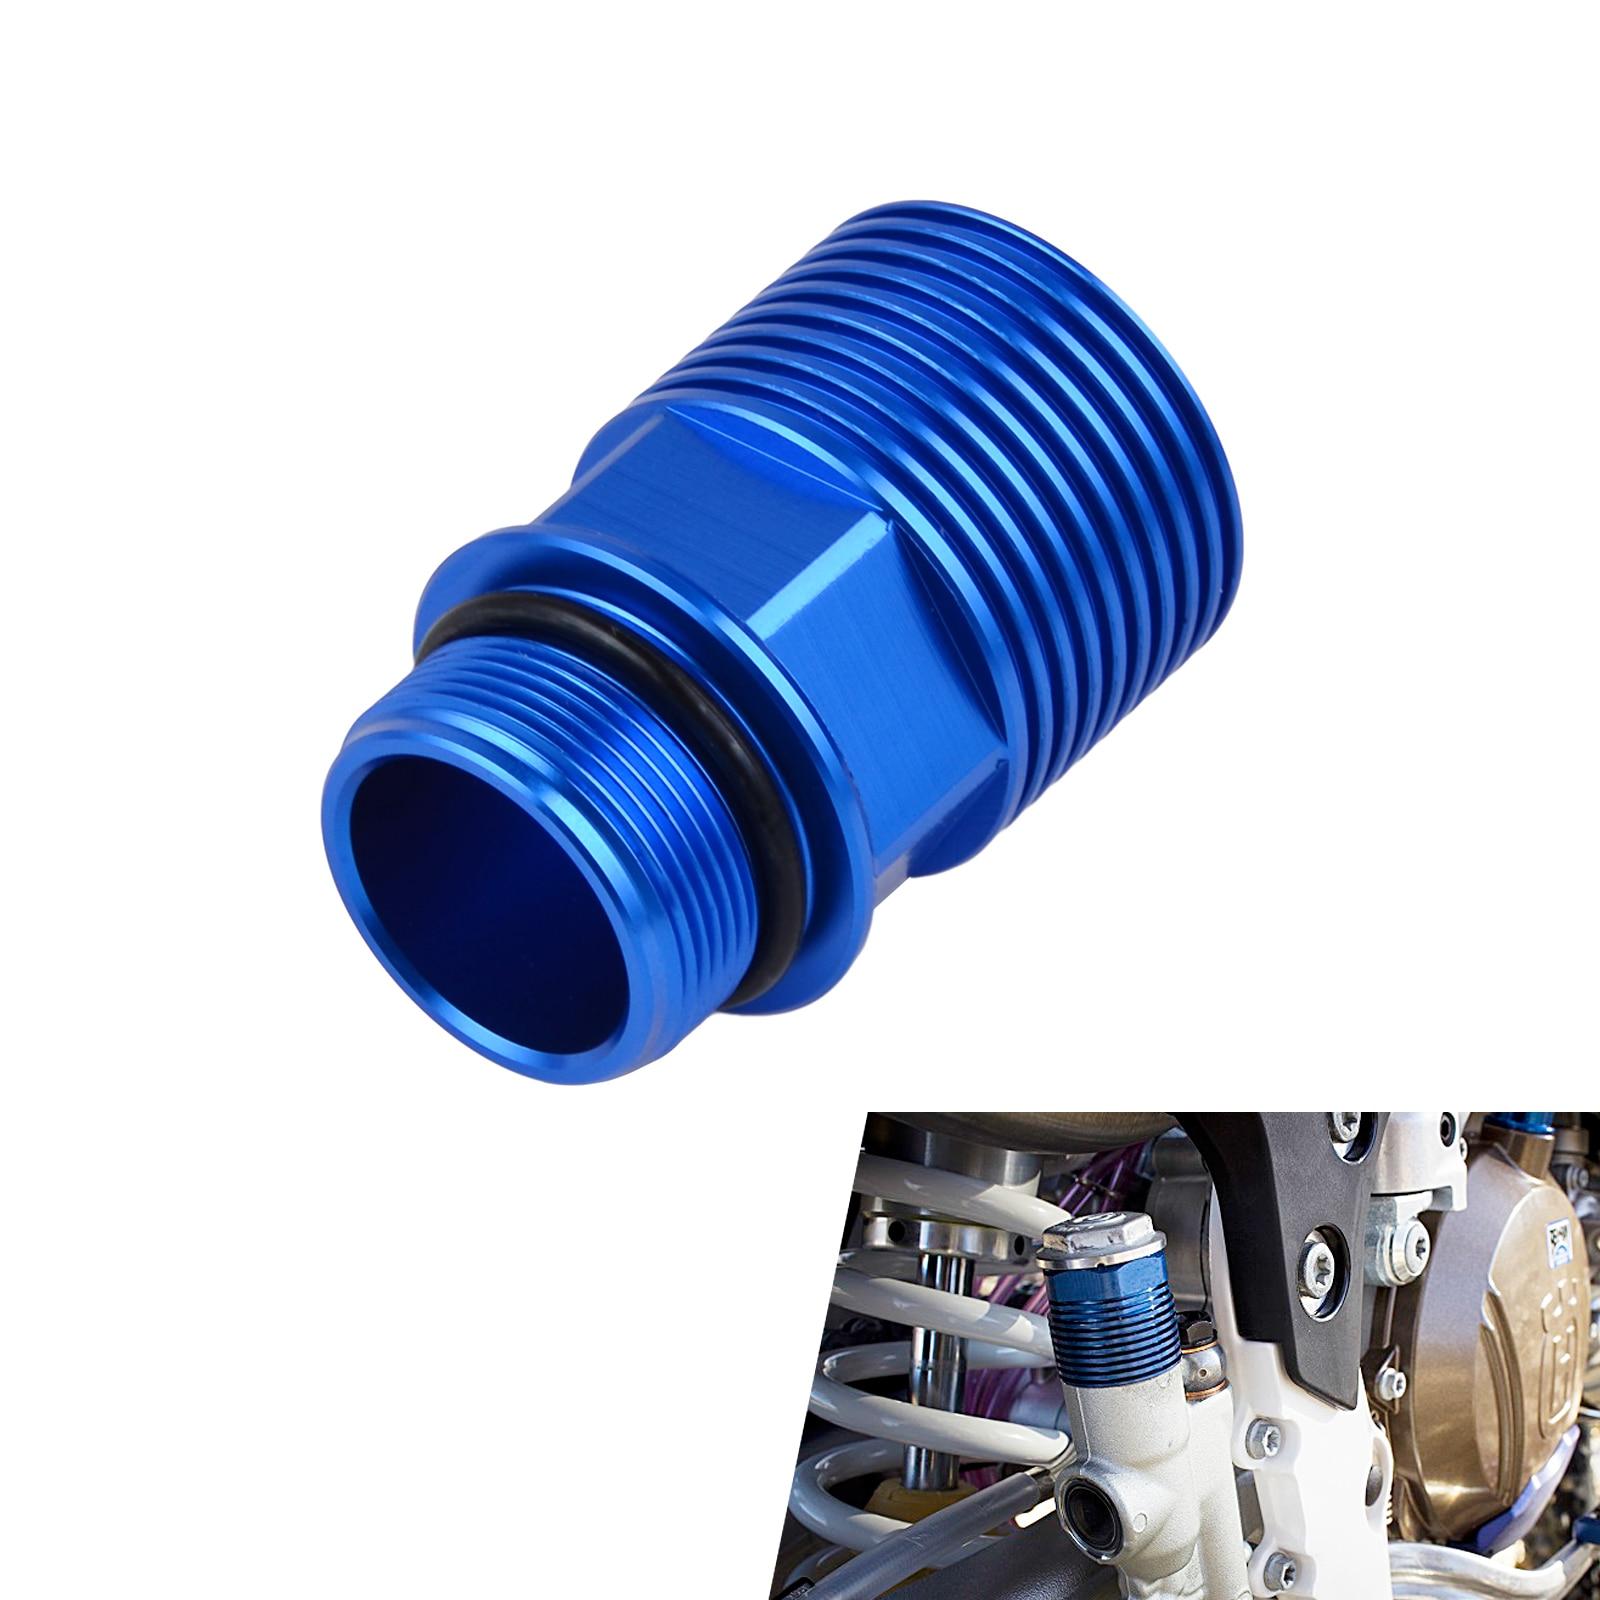 NICECNC CNC Rear Brake Reservoir Extender For Husqvarna TE FE TC FC 125 250 300 350 450 501 2014 2015 2016 TE250 FE350 FE450 nicecnc cnc billet brake clutch